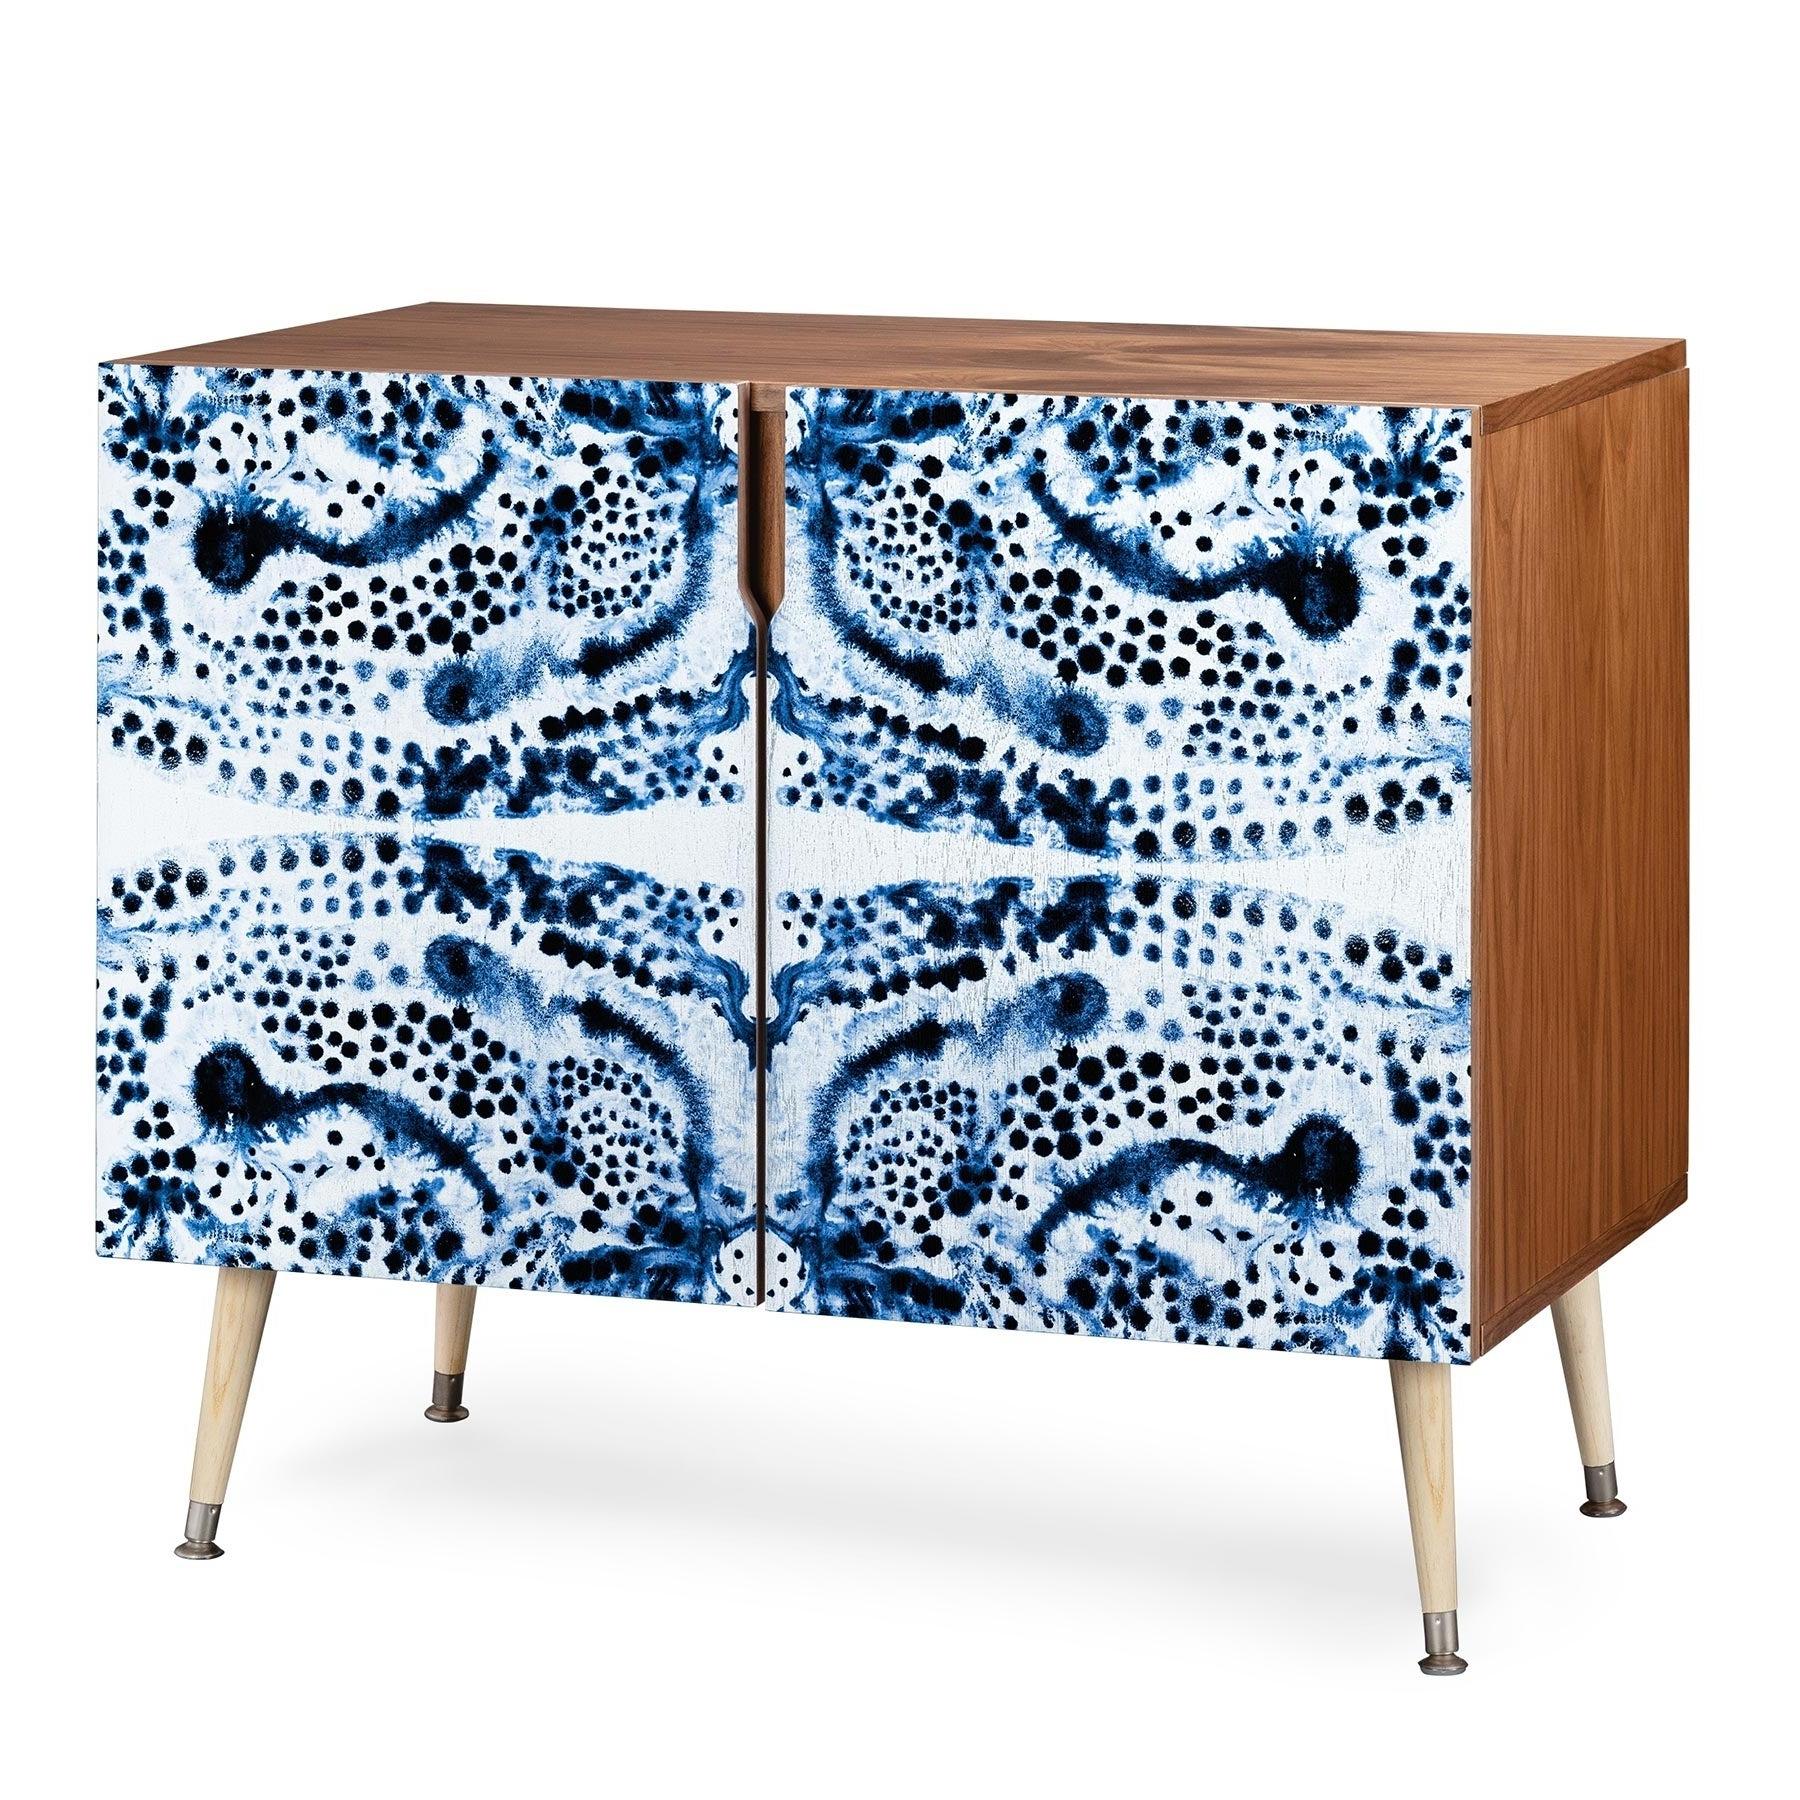 Deny Designs Symmetric Blue Swirl Credenza (birch Or Walnut, 3 Leg Options) Throughout Wooden Deconstruction Credenzas (View 5 of 20)